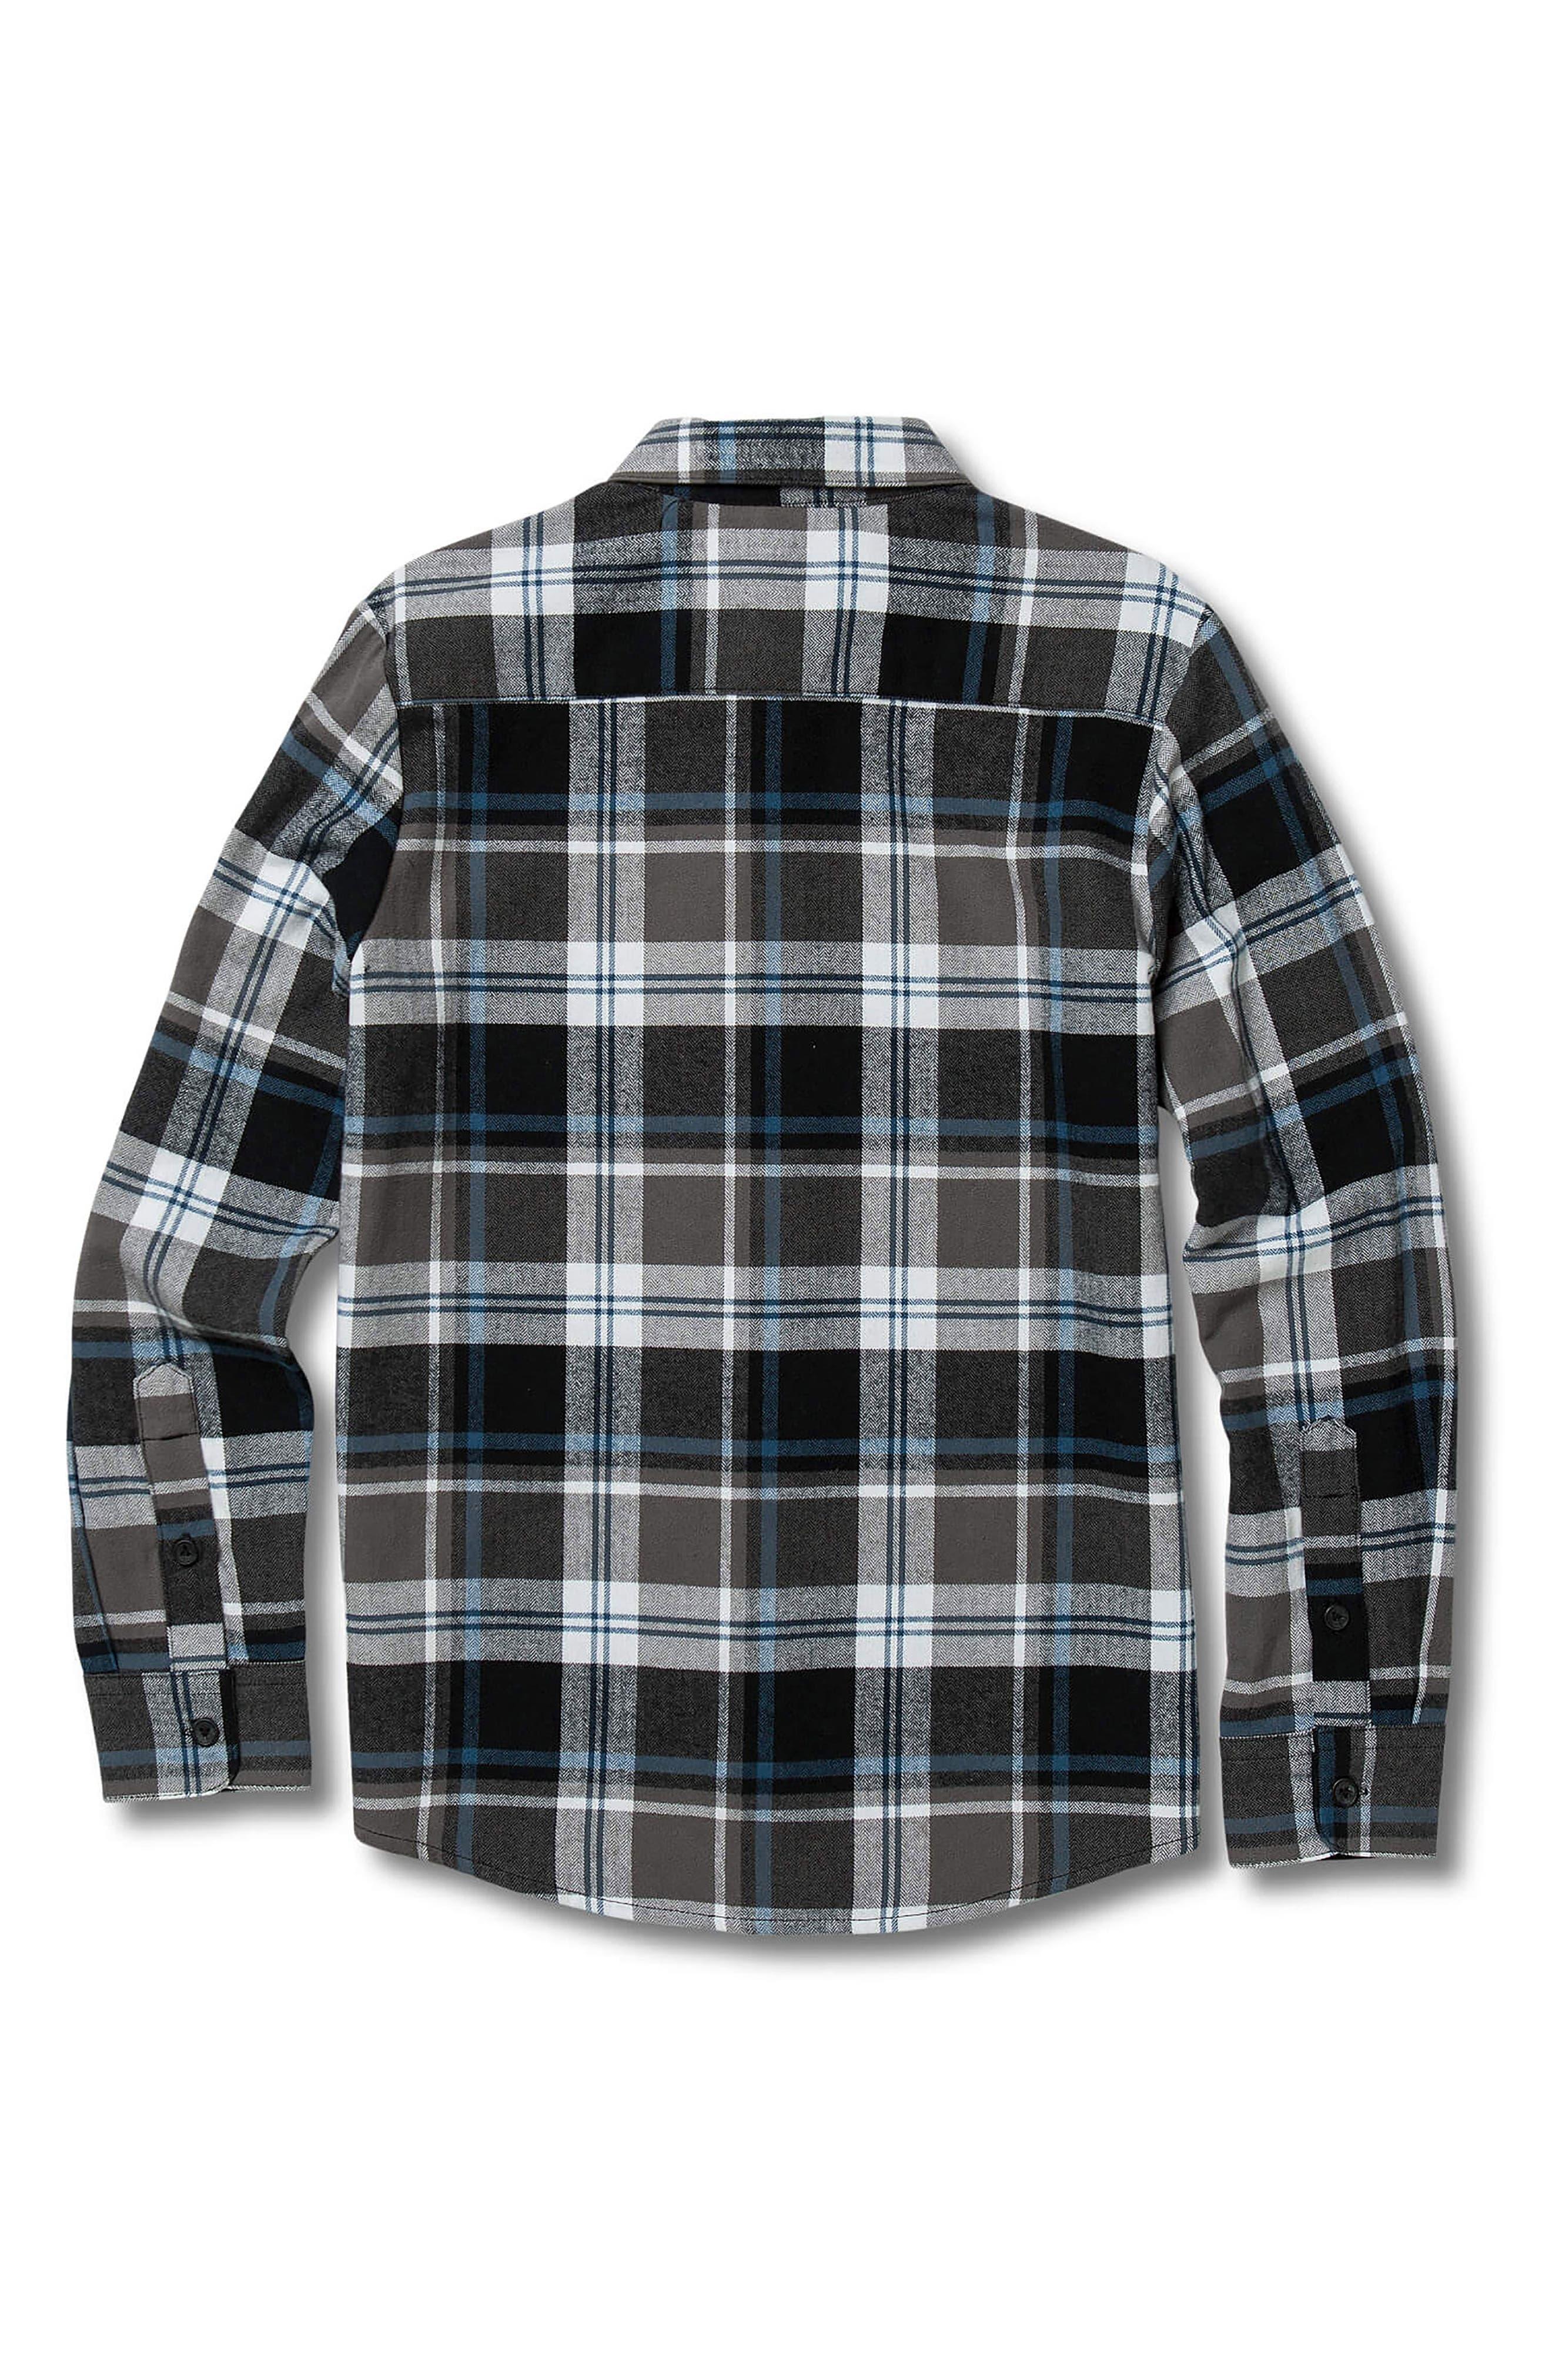 VOLCOM, Caden Plaid Flannel Shirt, Alternate thumbnail 2, color, PEWTER